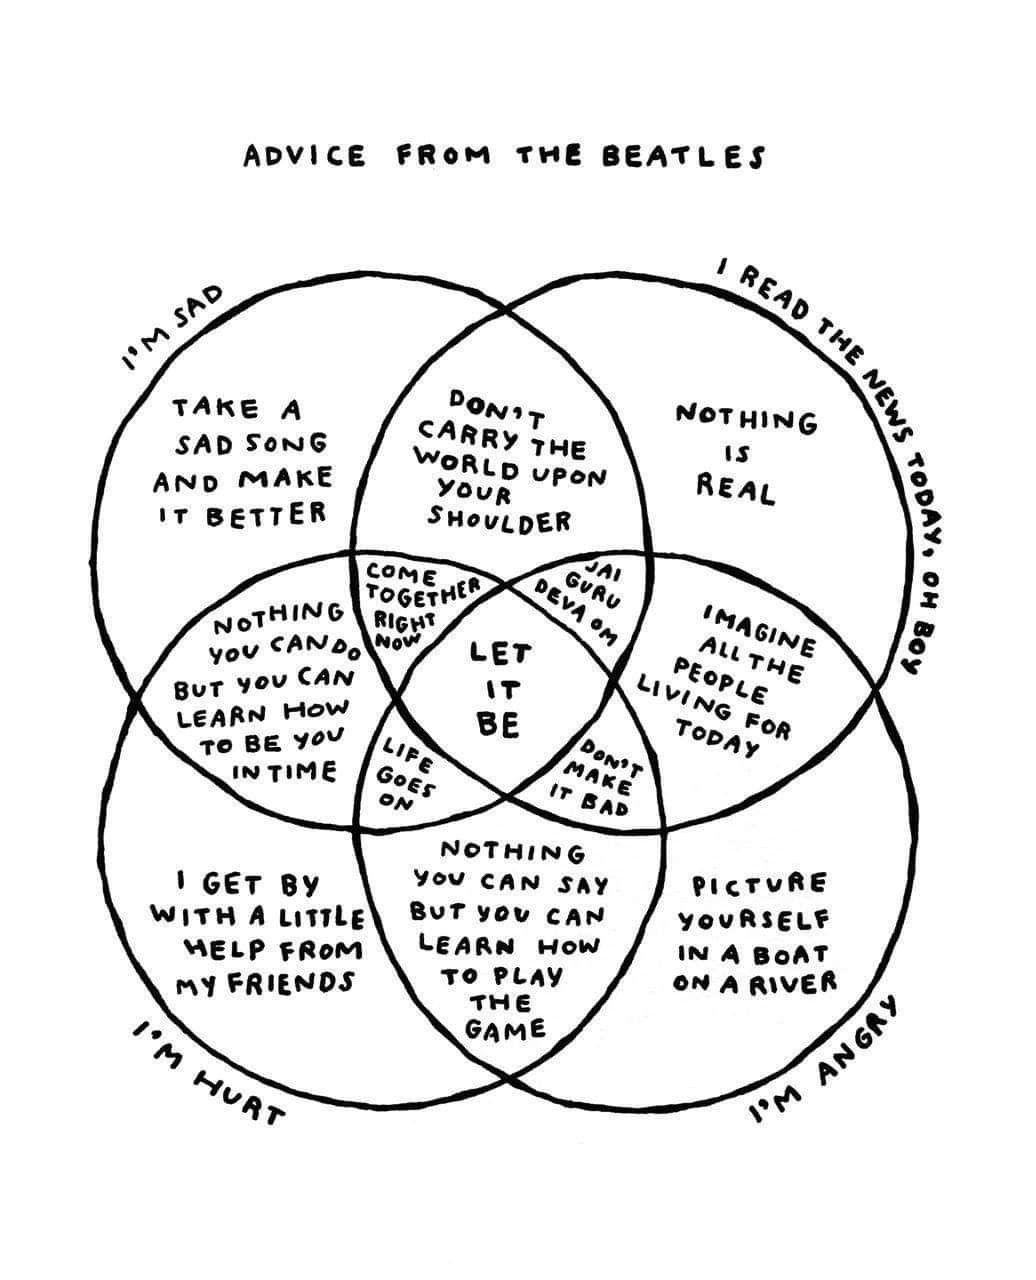 Pin By Joost Van Den Donk On Ondernemerschap Beatles Lyrics Beatles Quotes Music Quotes Lyrics